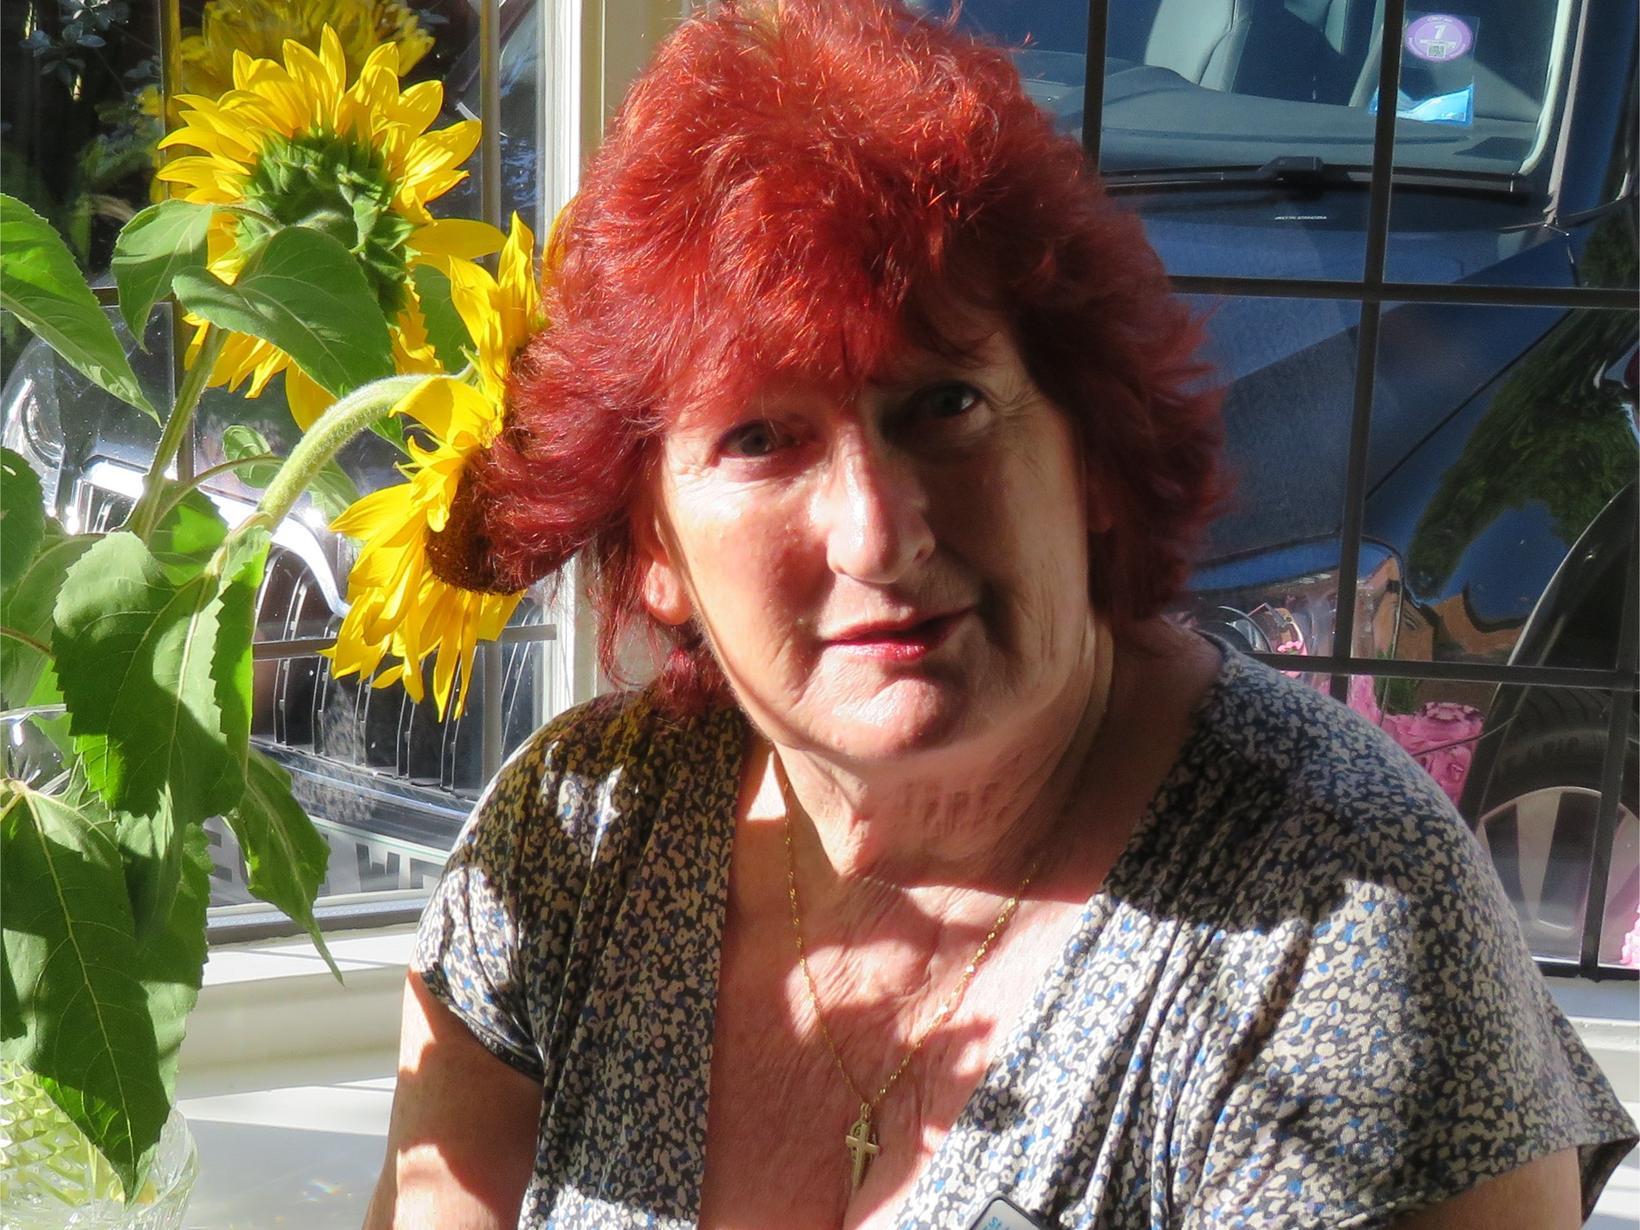 Wilma from York, United Kingdom